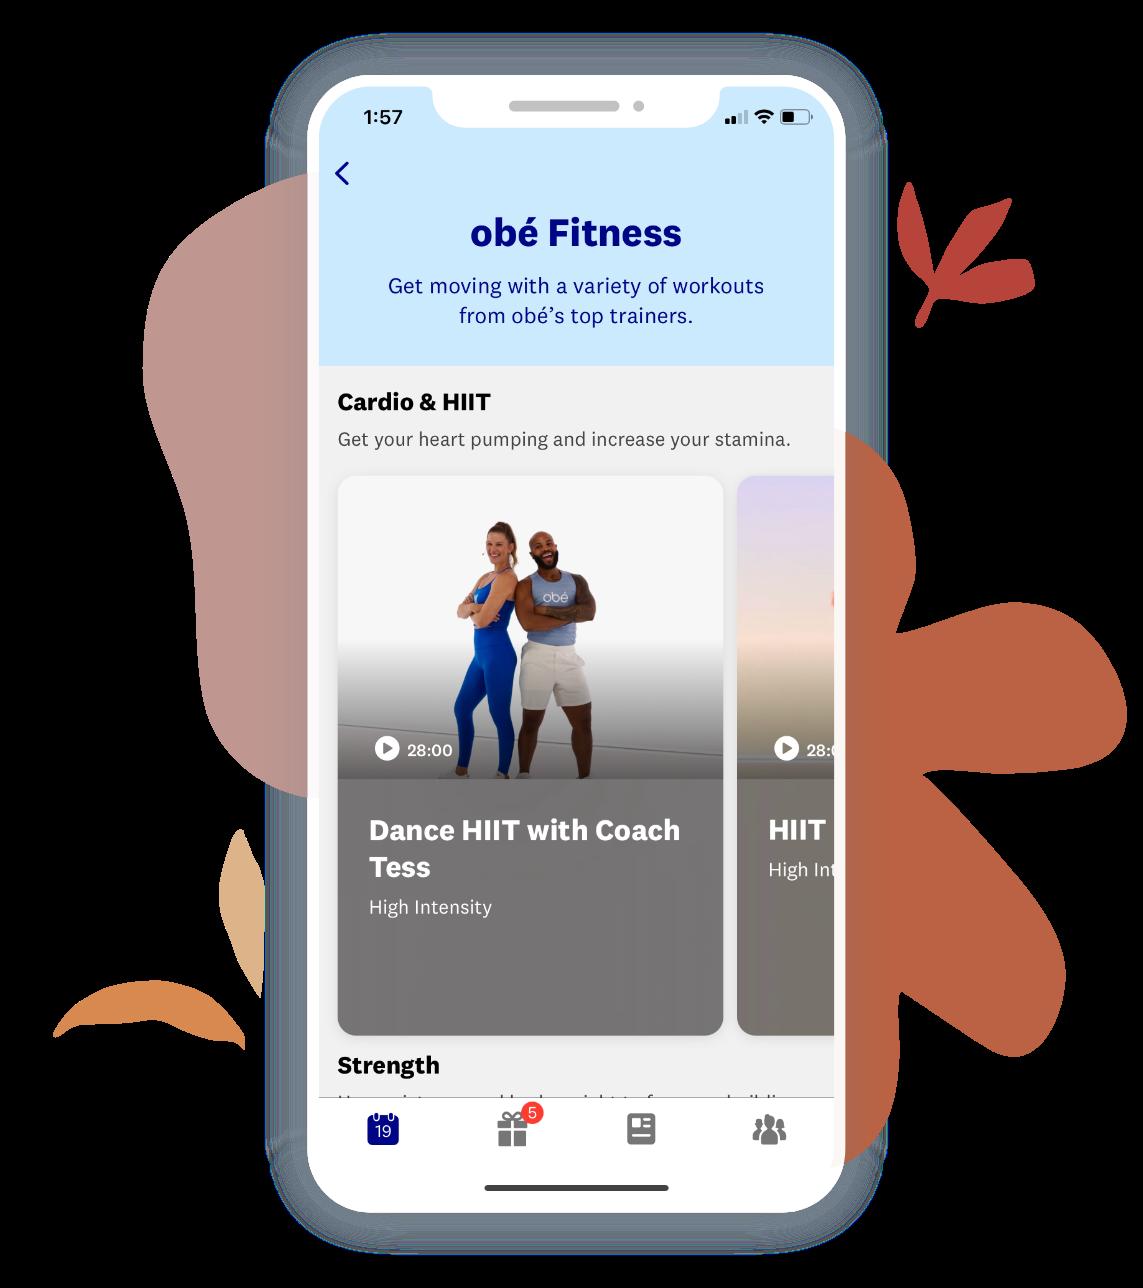 A screenshot of the Obé Fitness app.